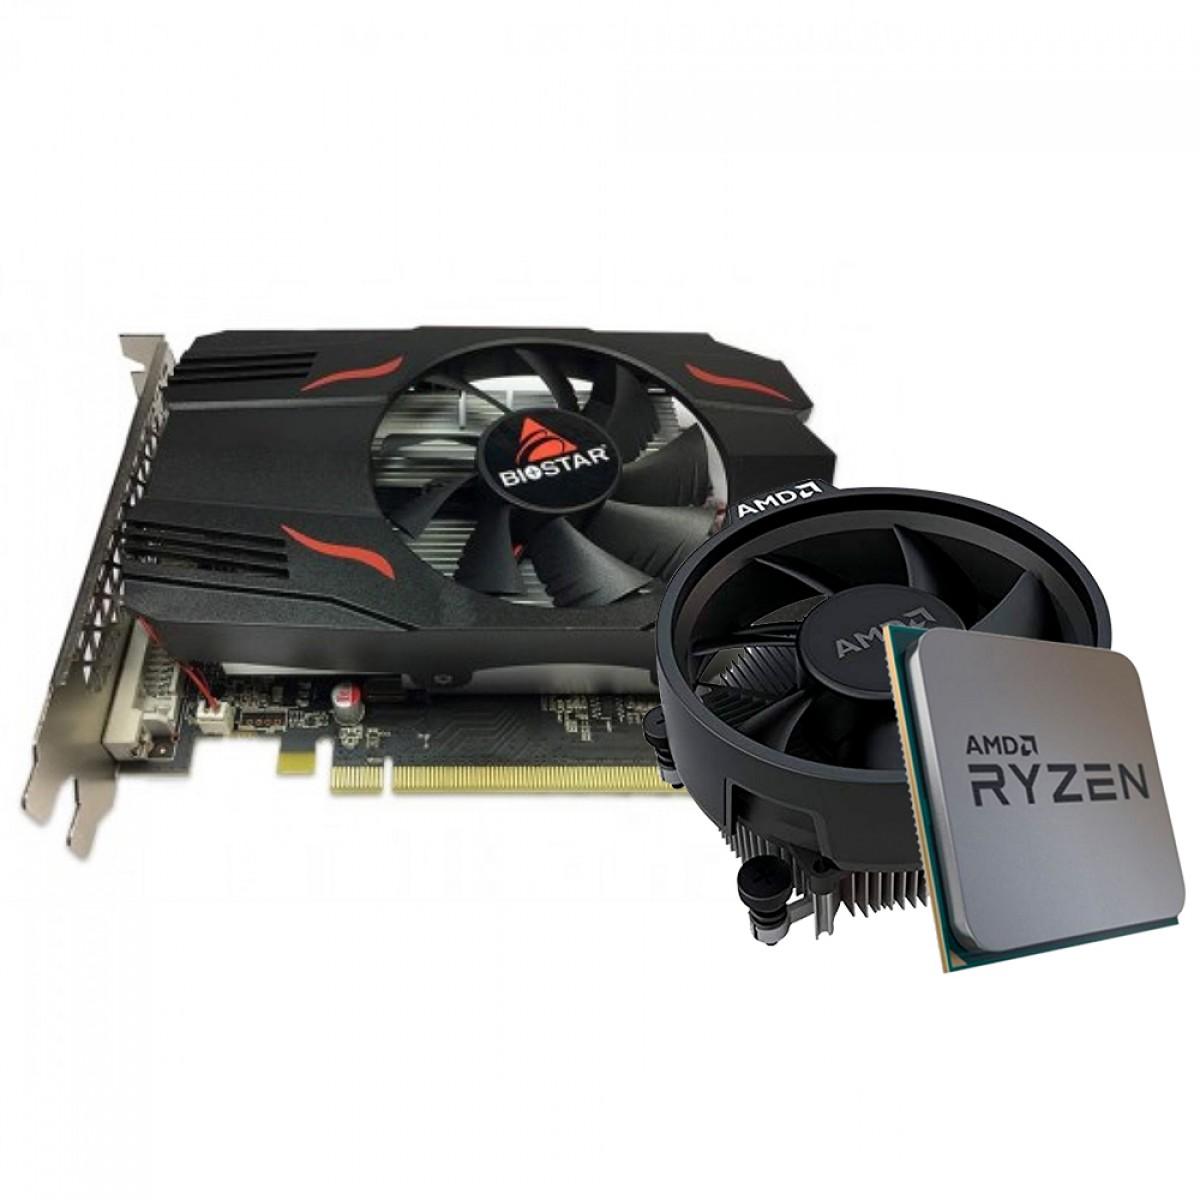 Kit Upgrade Biostar Radeon RX 550 2GB + AMD Ryzen 5 3500